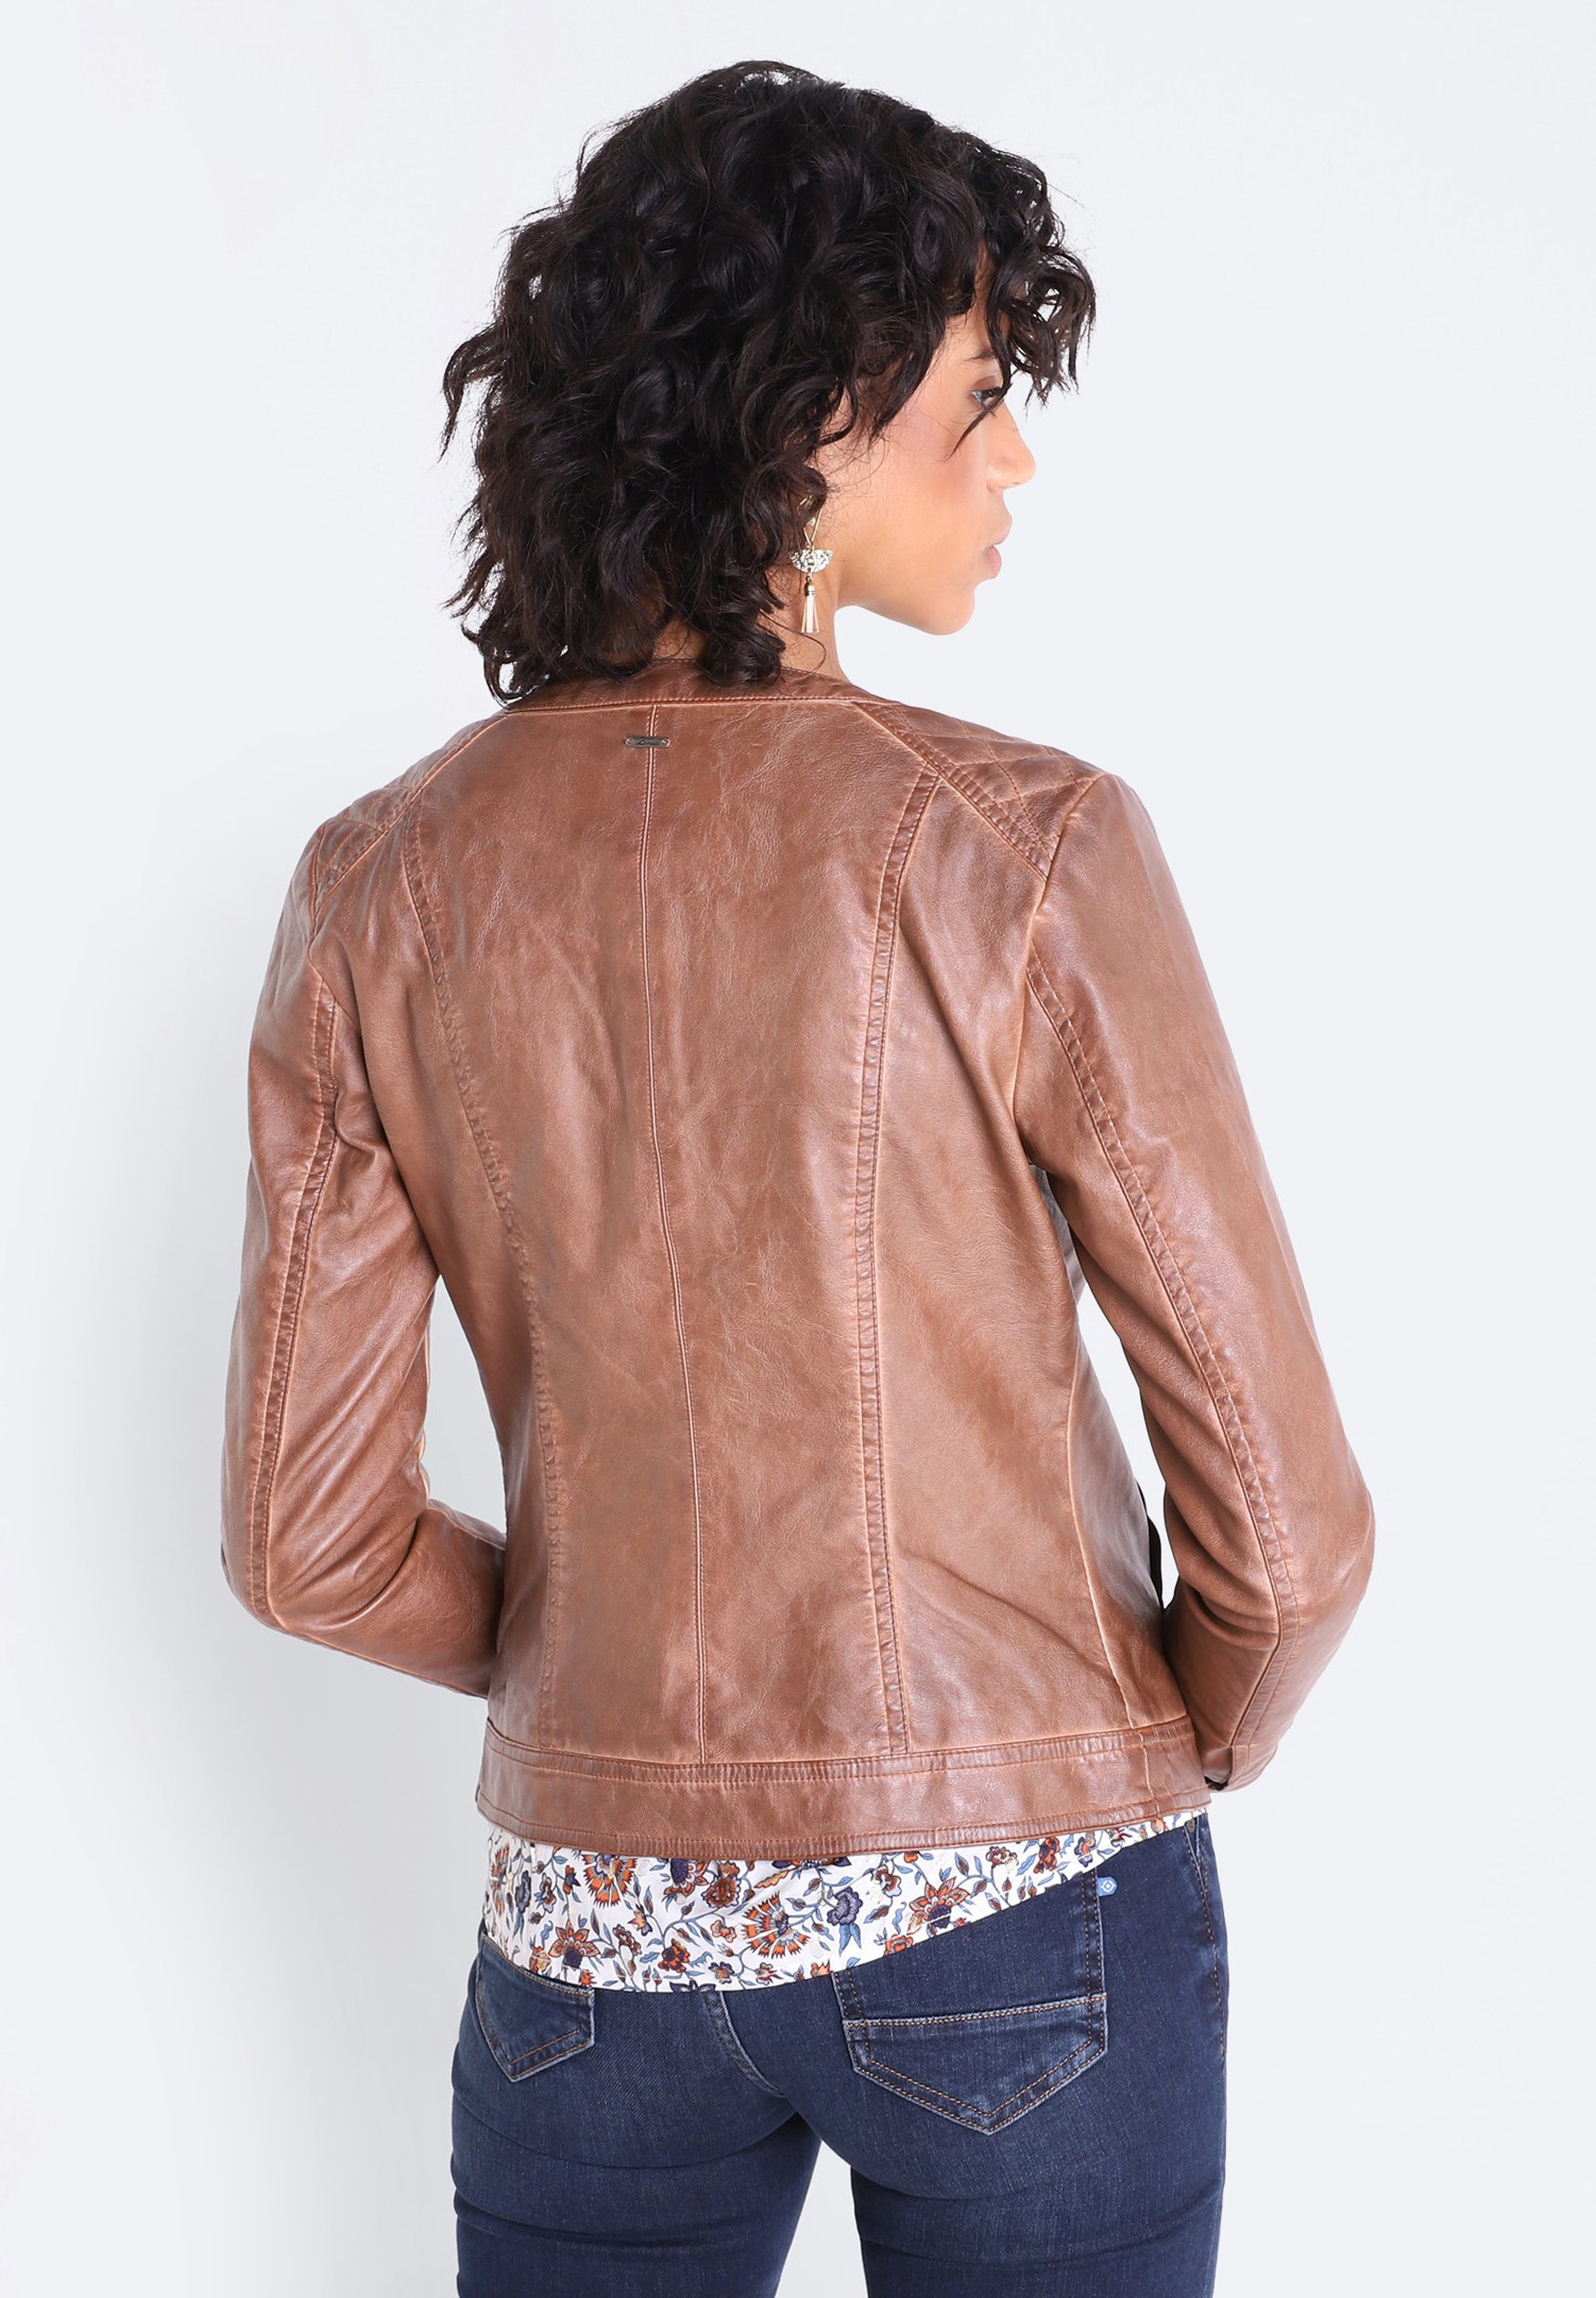 BONOBO Jeans BONOBO Kunstlederjacke marron clair/orange